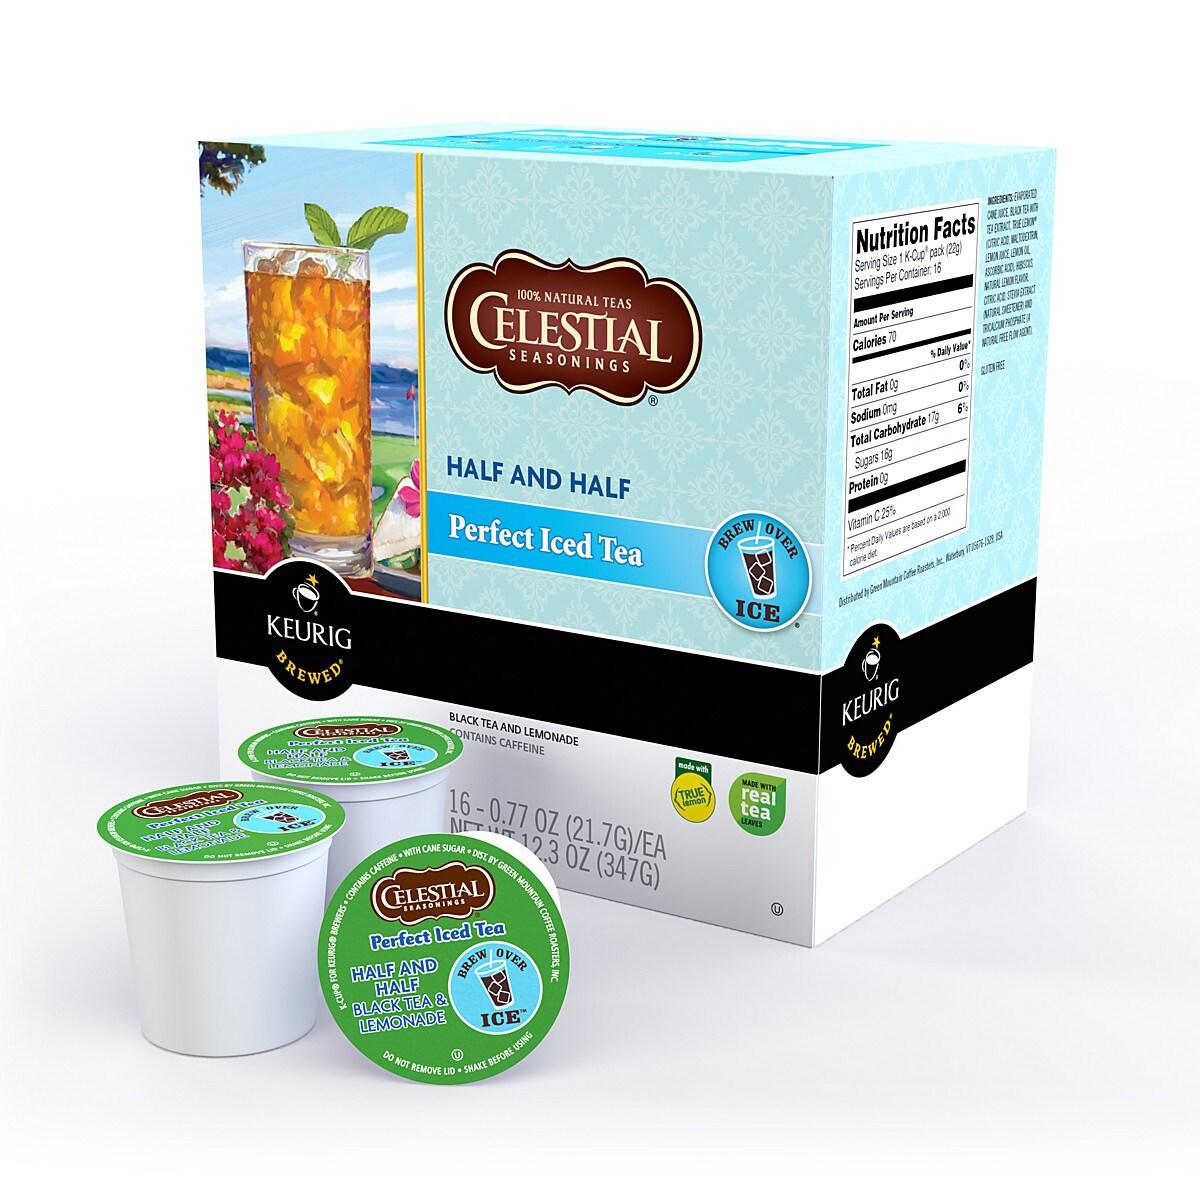 Celestial Seasonings Half and Half Perfect Iced Tea K-Cups for Keurig Brewers (Case of 88)